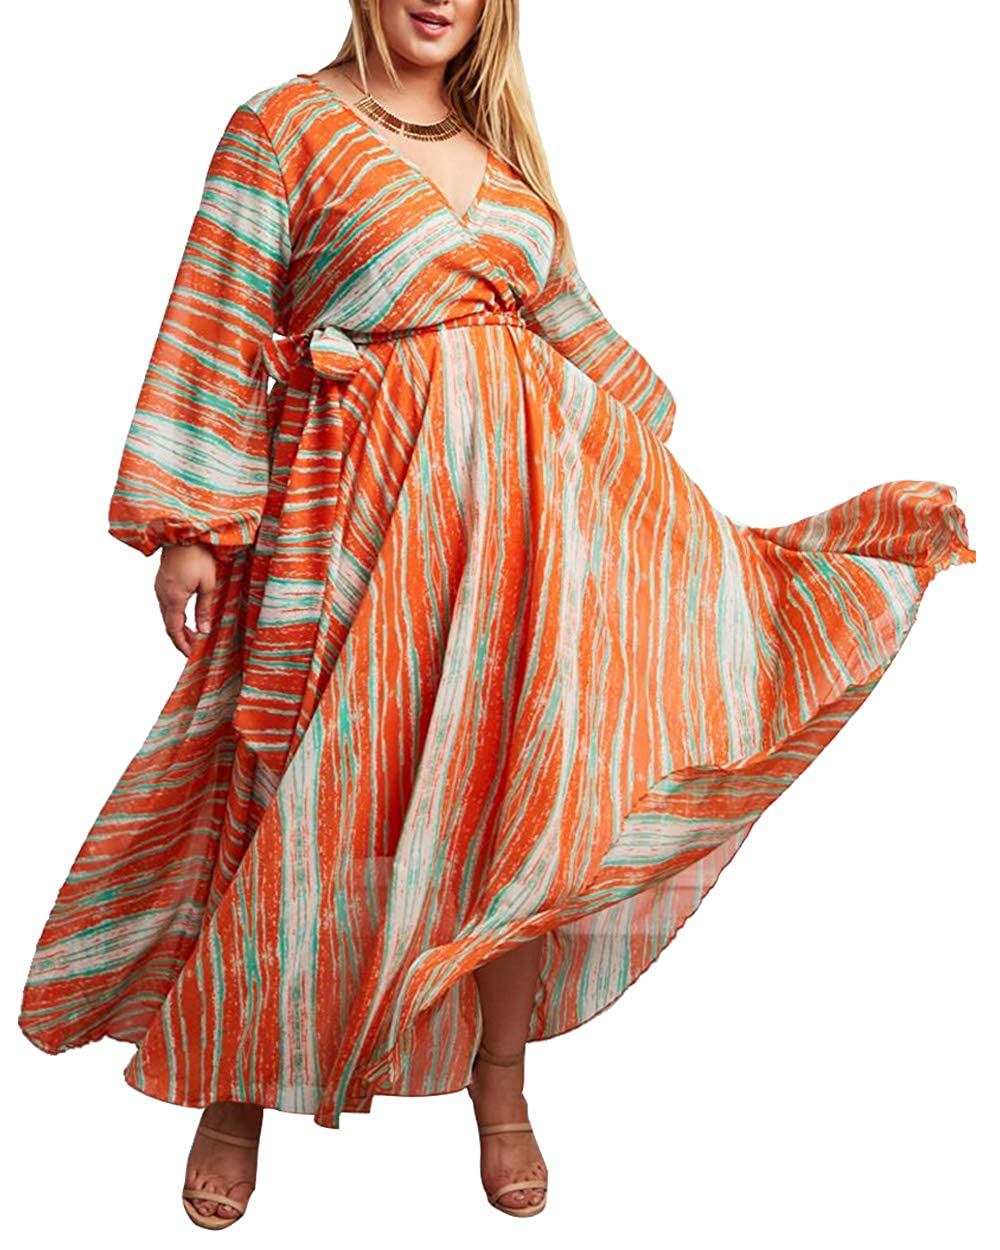 CACNCUT Women\'s Plus Size Maxi Dress Soft Flowing Waistband Printed Chiffon  Elegant